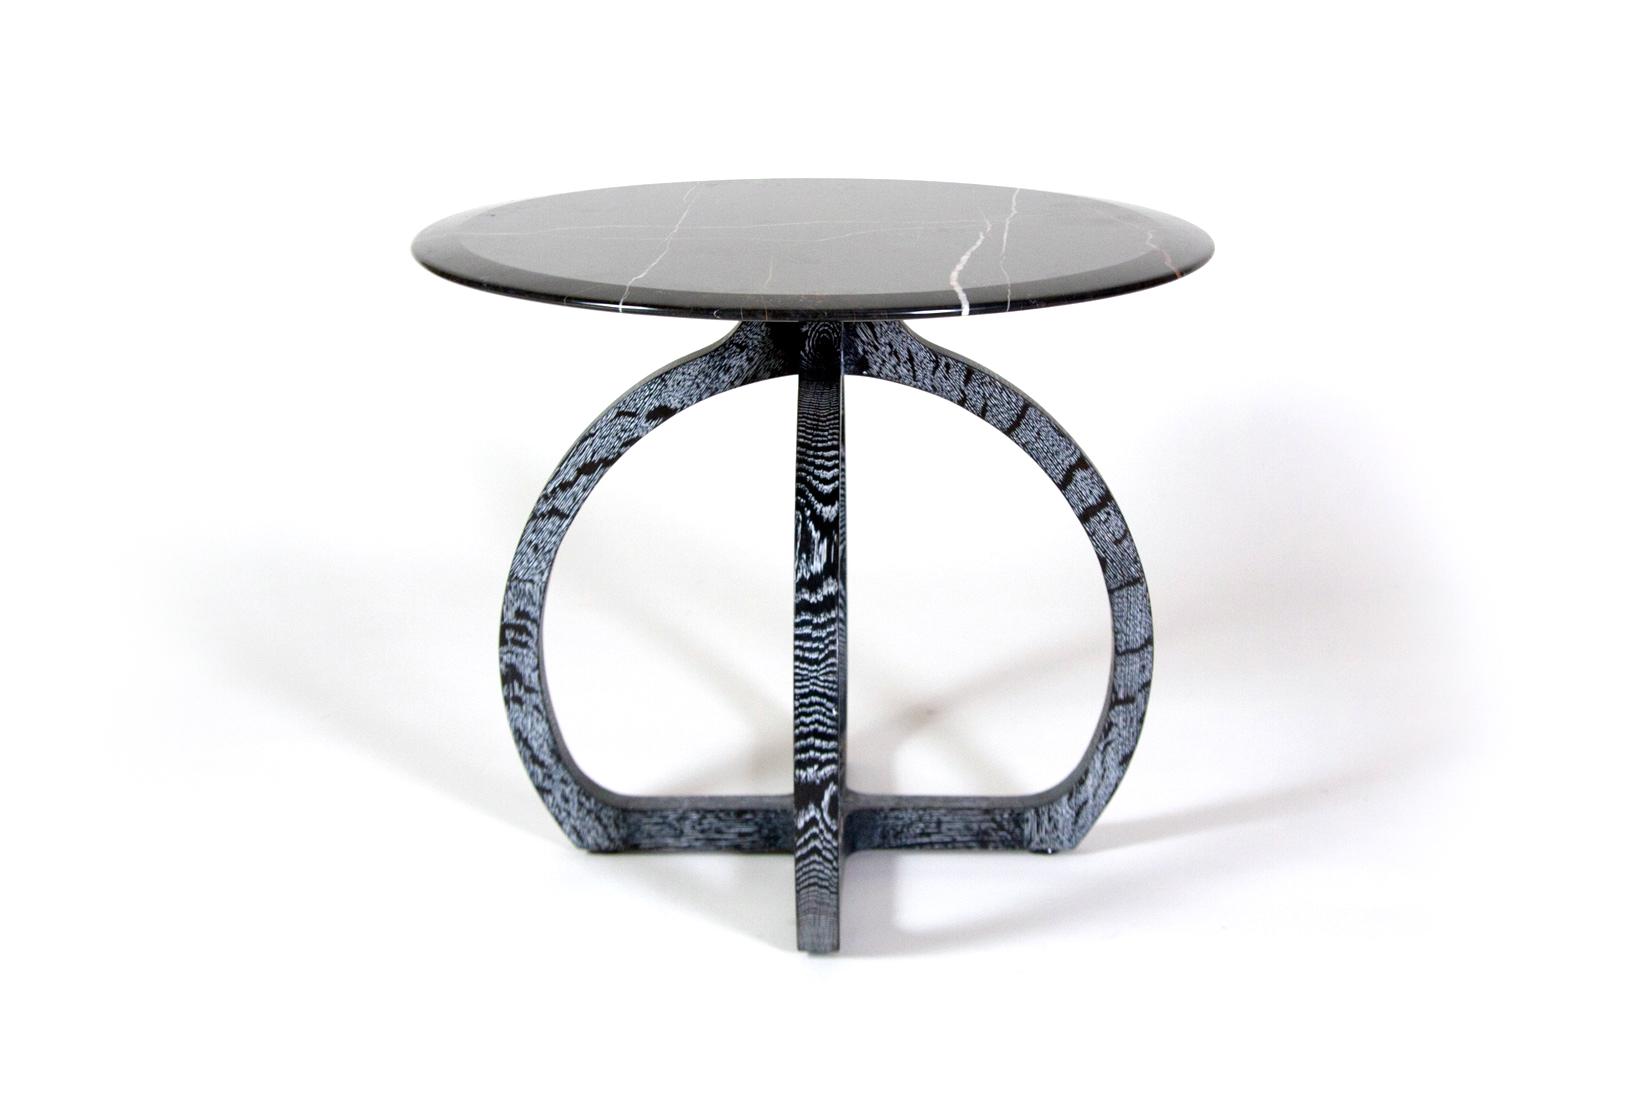 ELLIOT-EAKIN-Furniture---Ceruse-Side-Table---Front-View.jpg